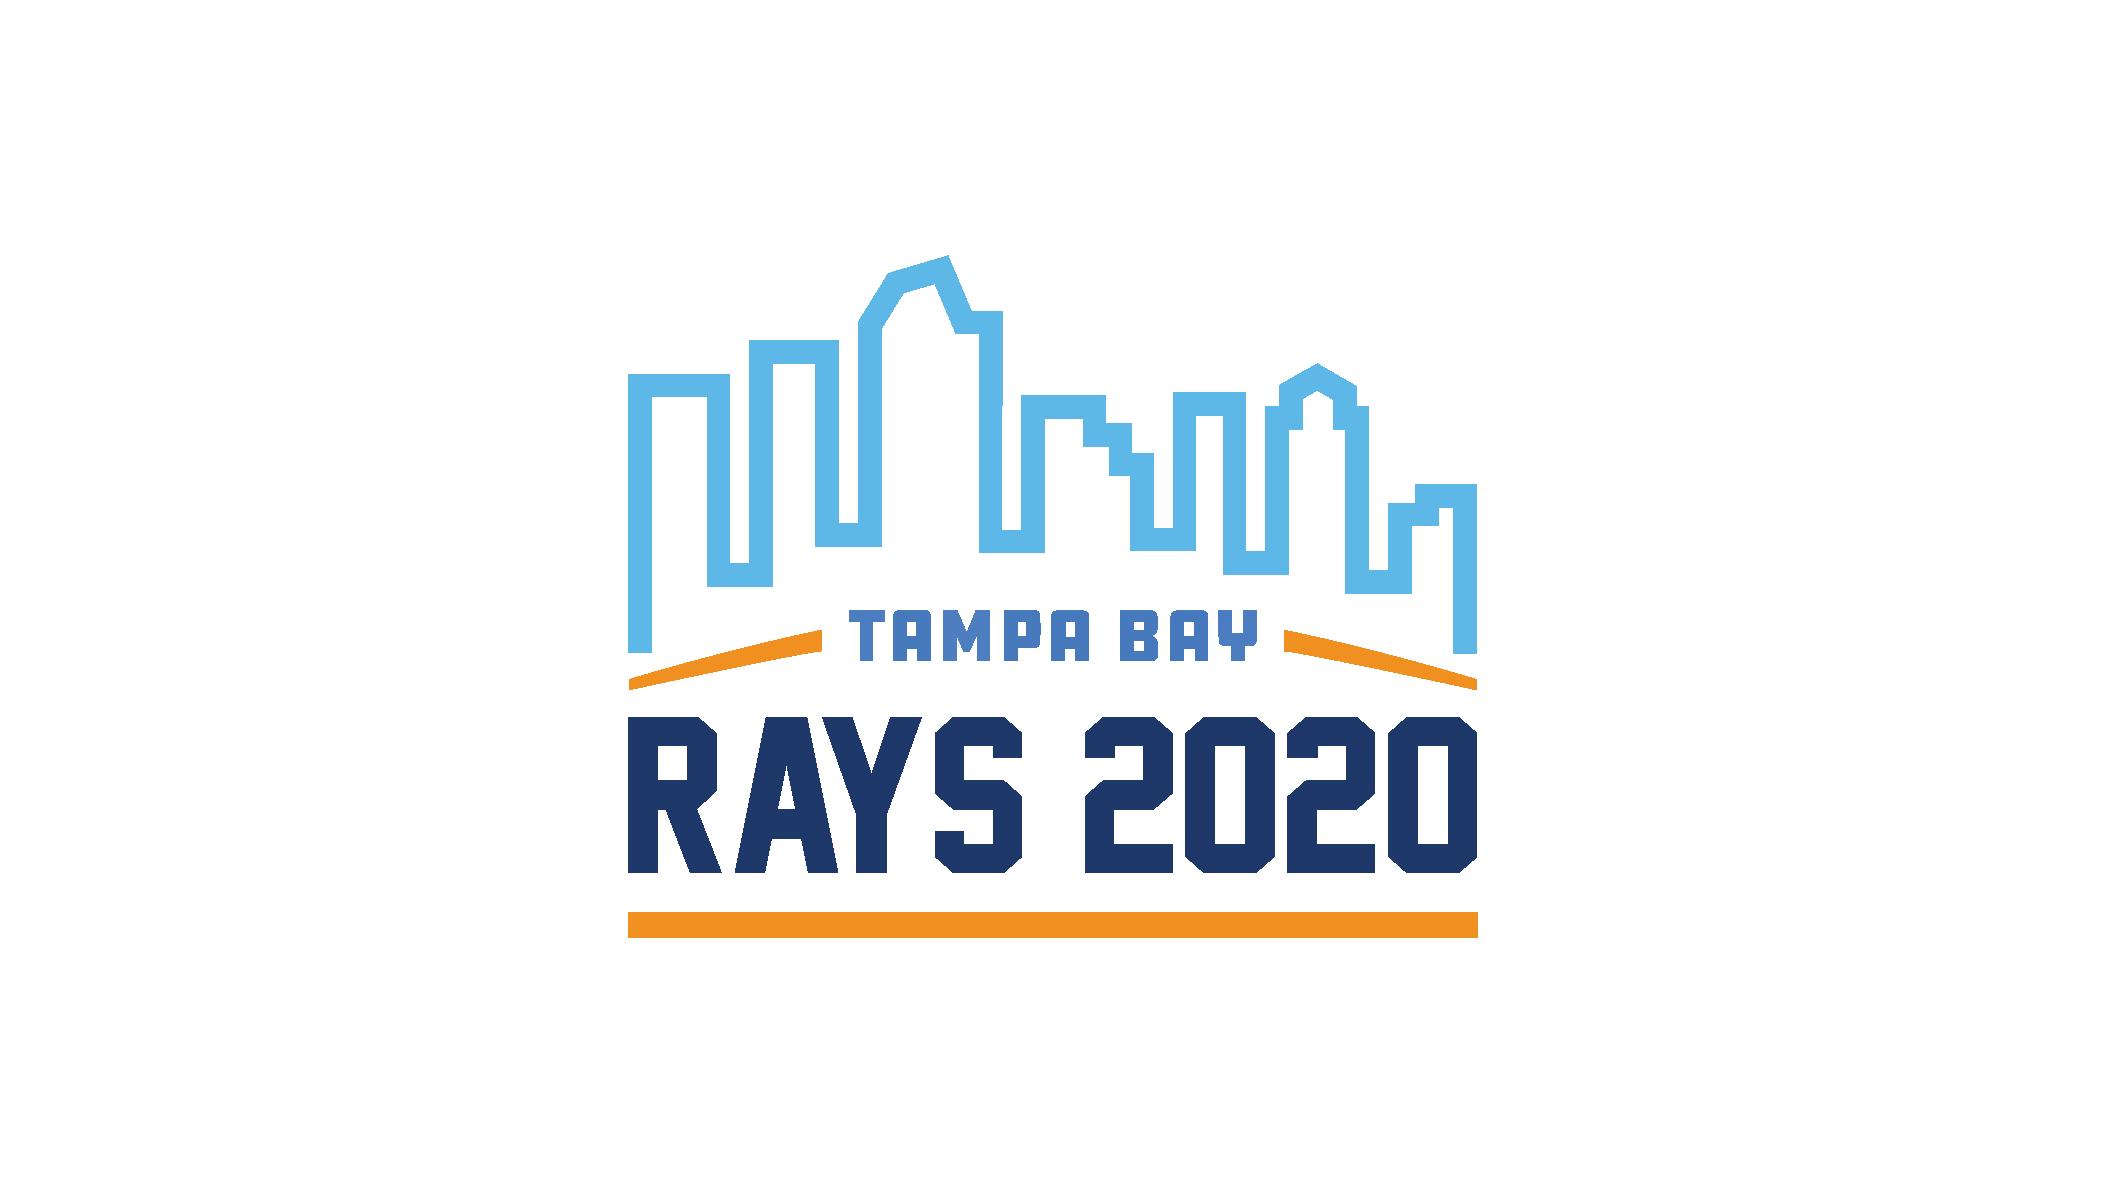 Tampa Bay Rays 2020